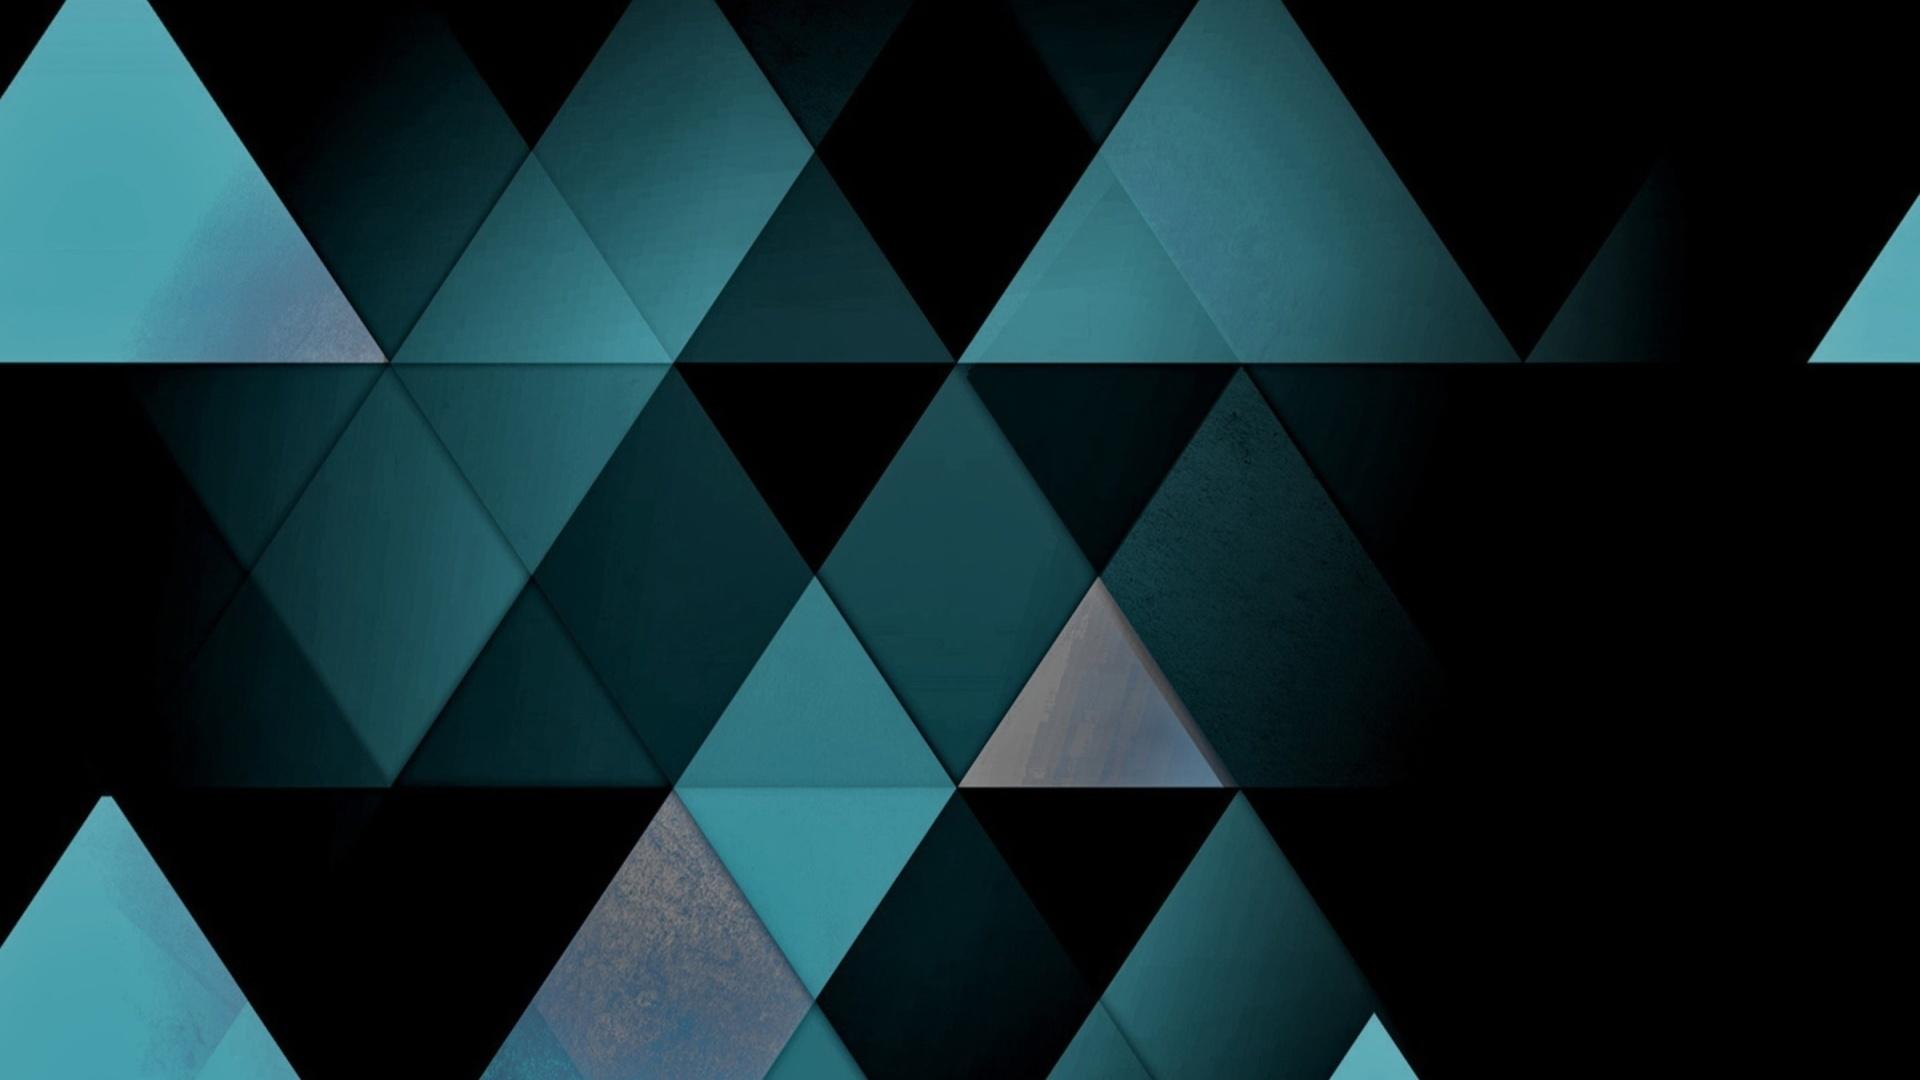 Shapes Triangle Desktop Wallpaper